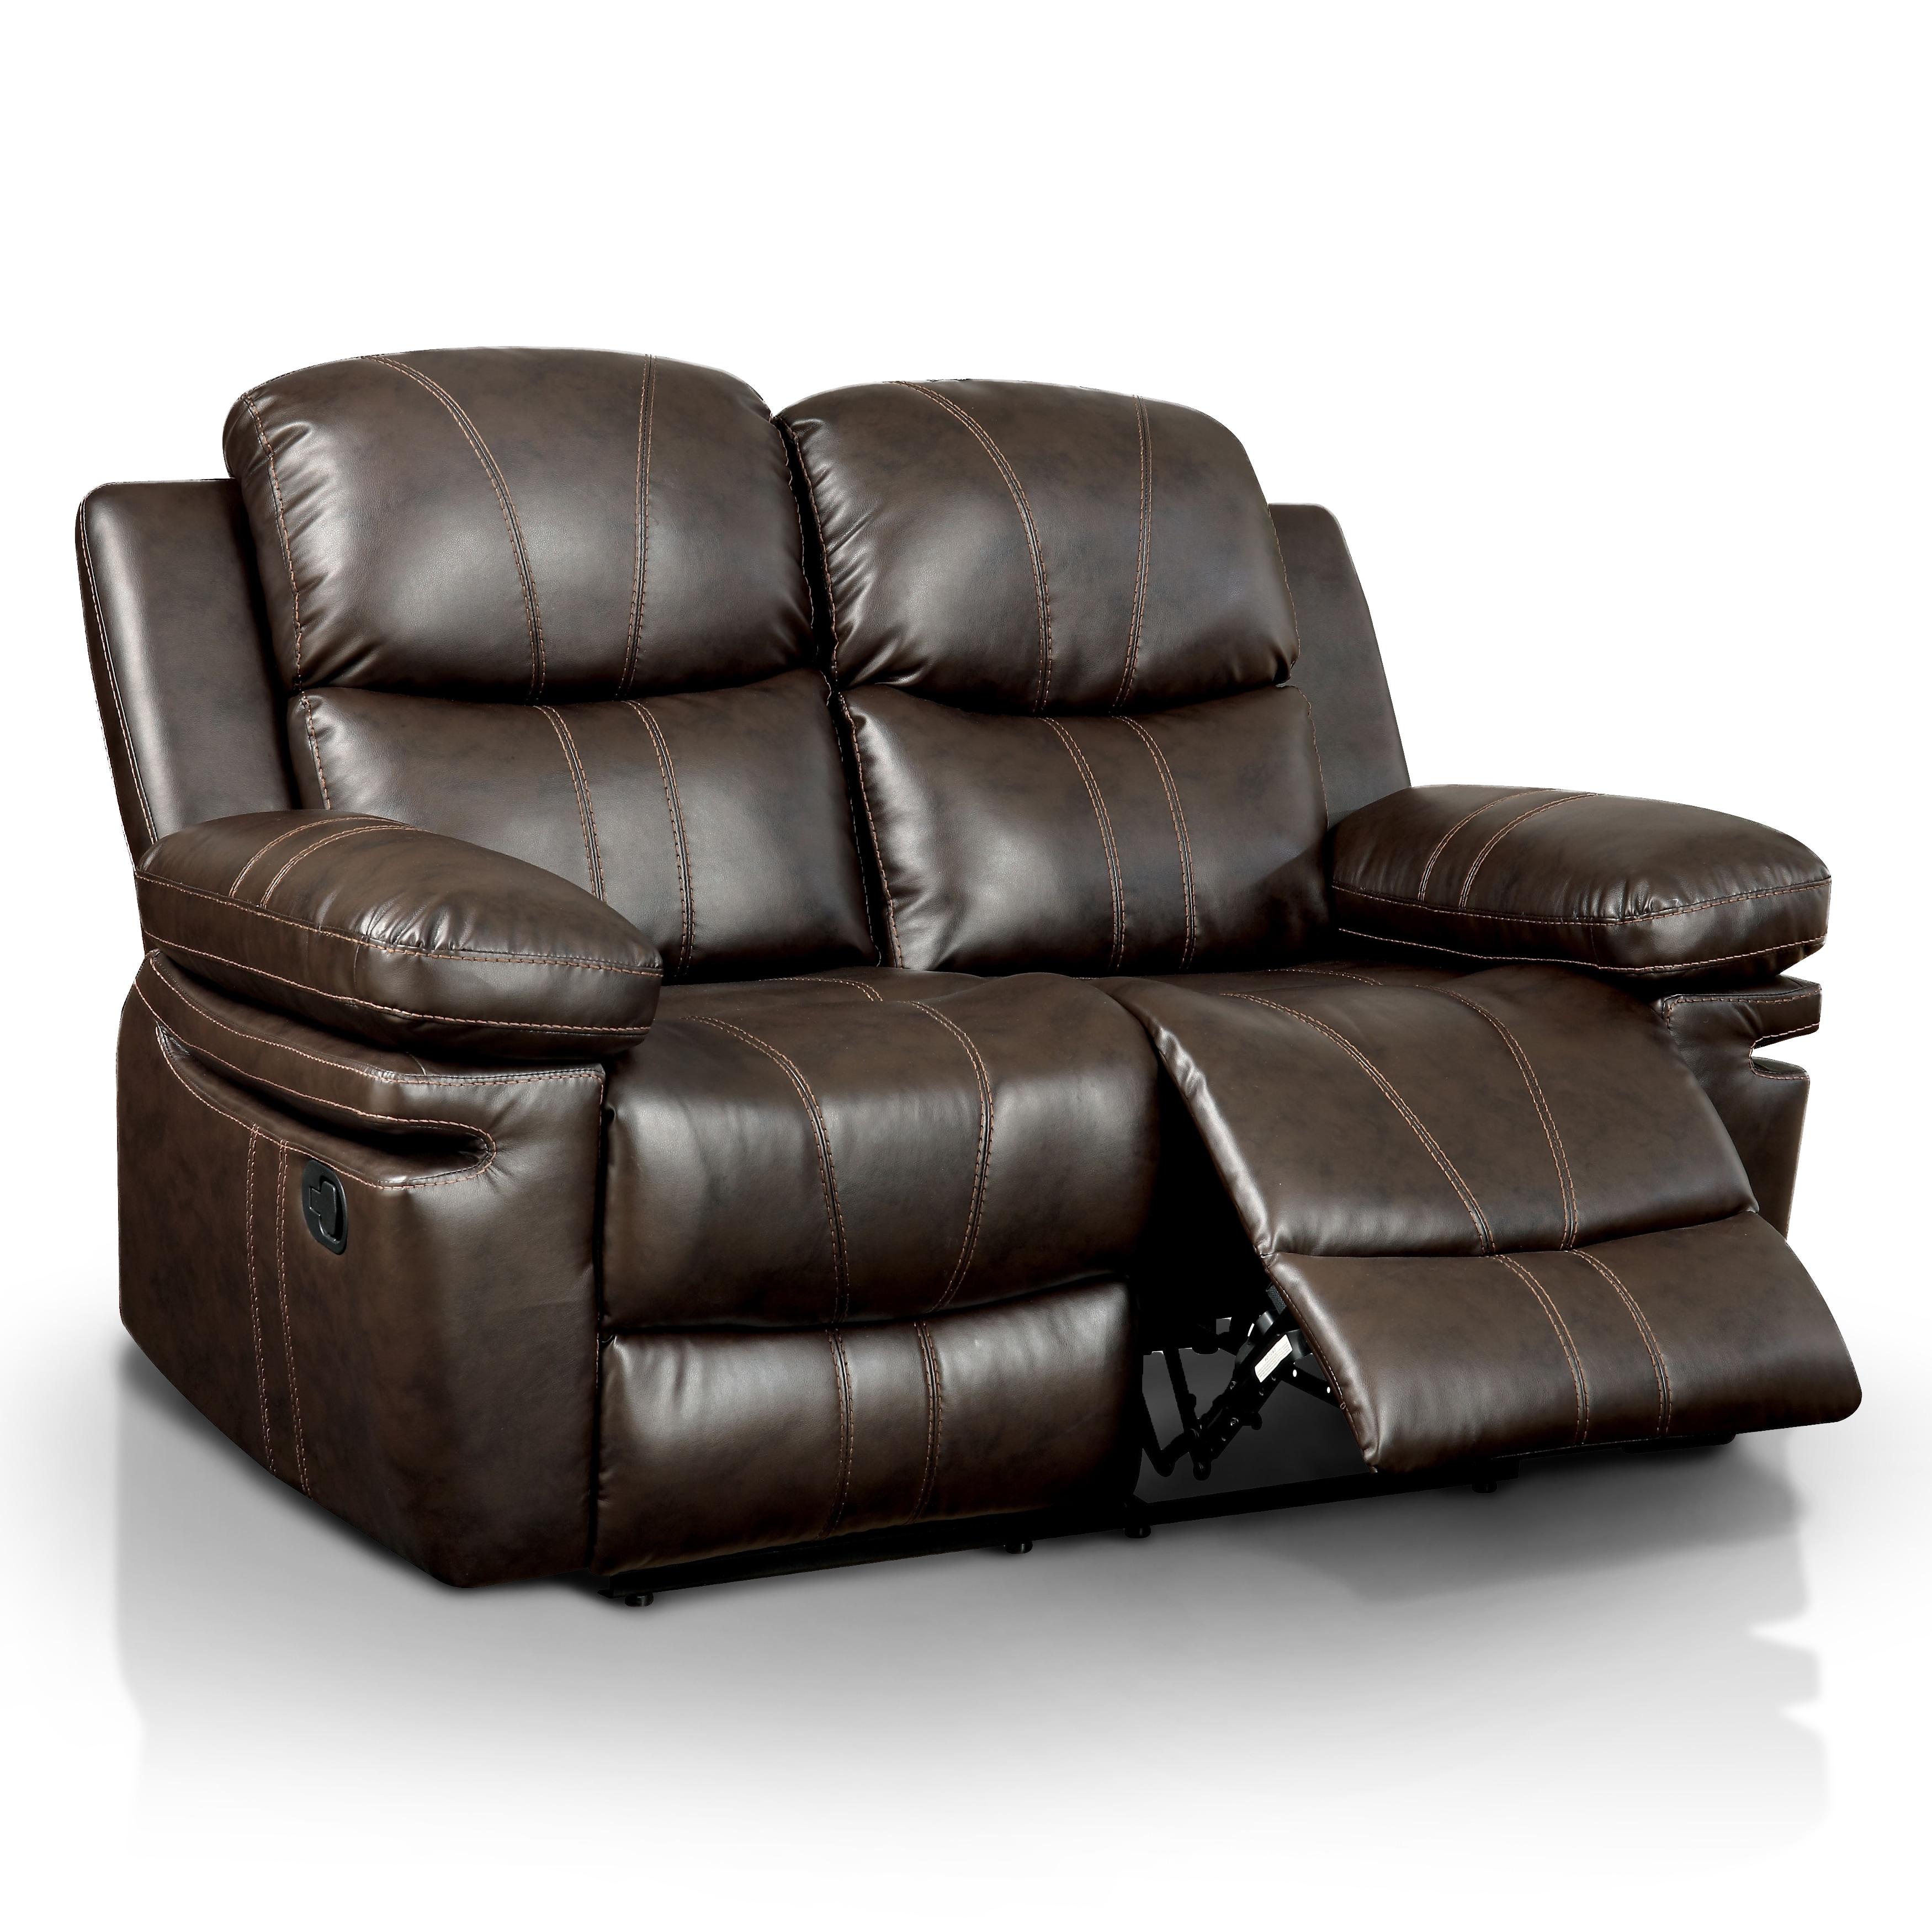 Furniture of America Ellister Transitional 3 Piece Brown Bonded